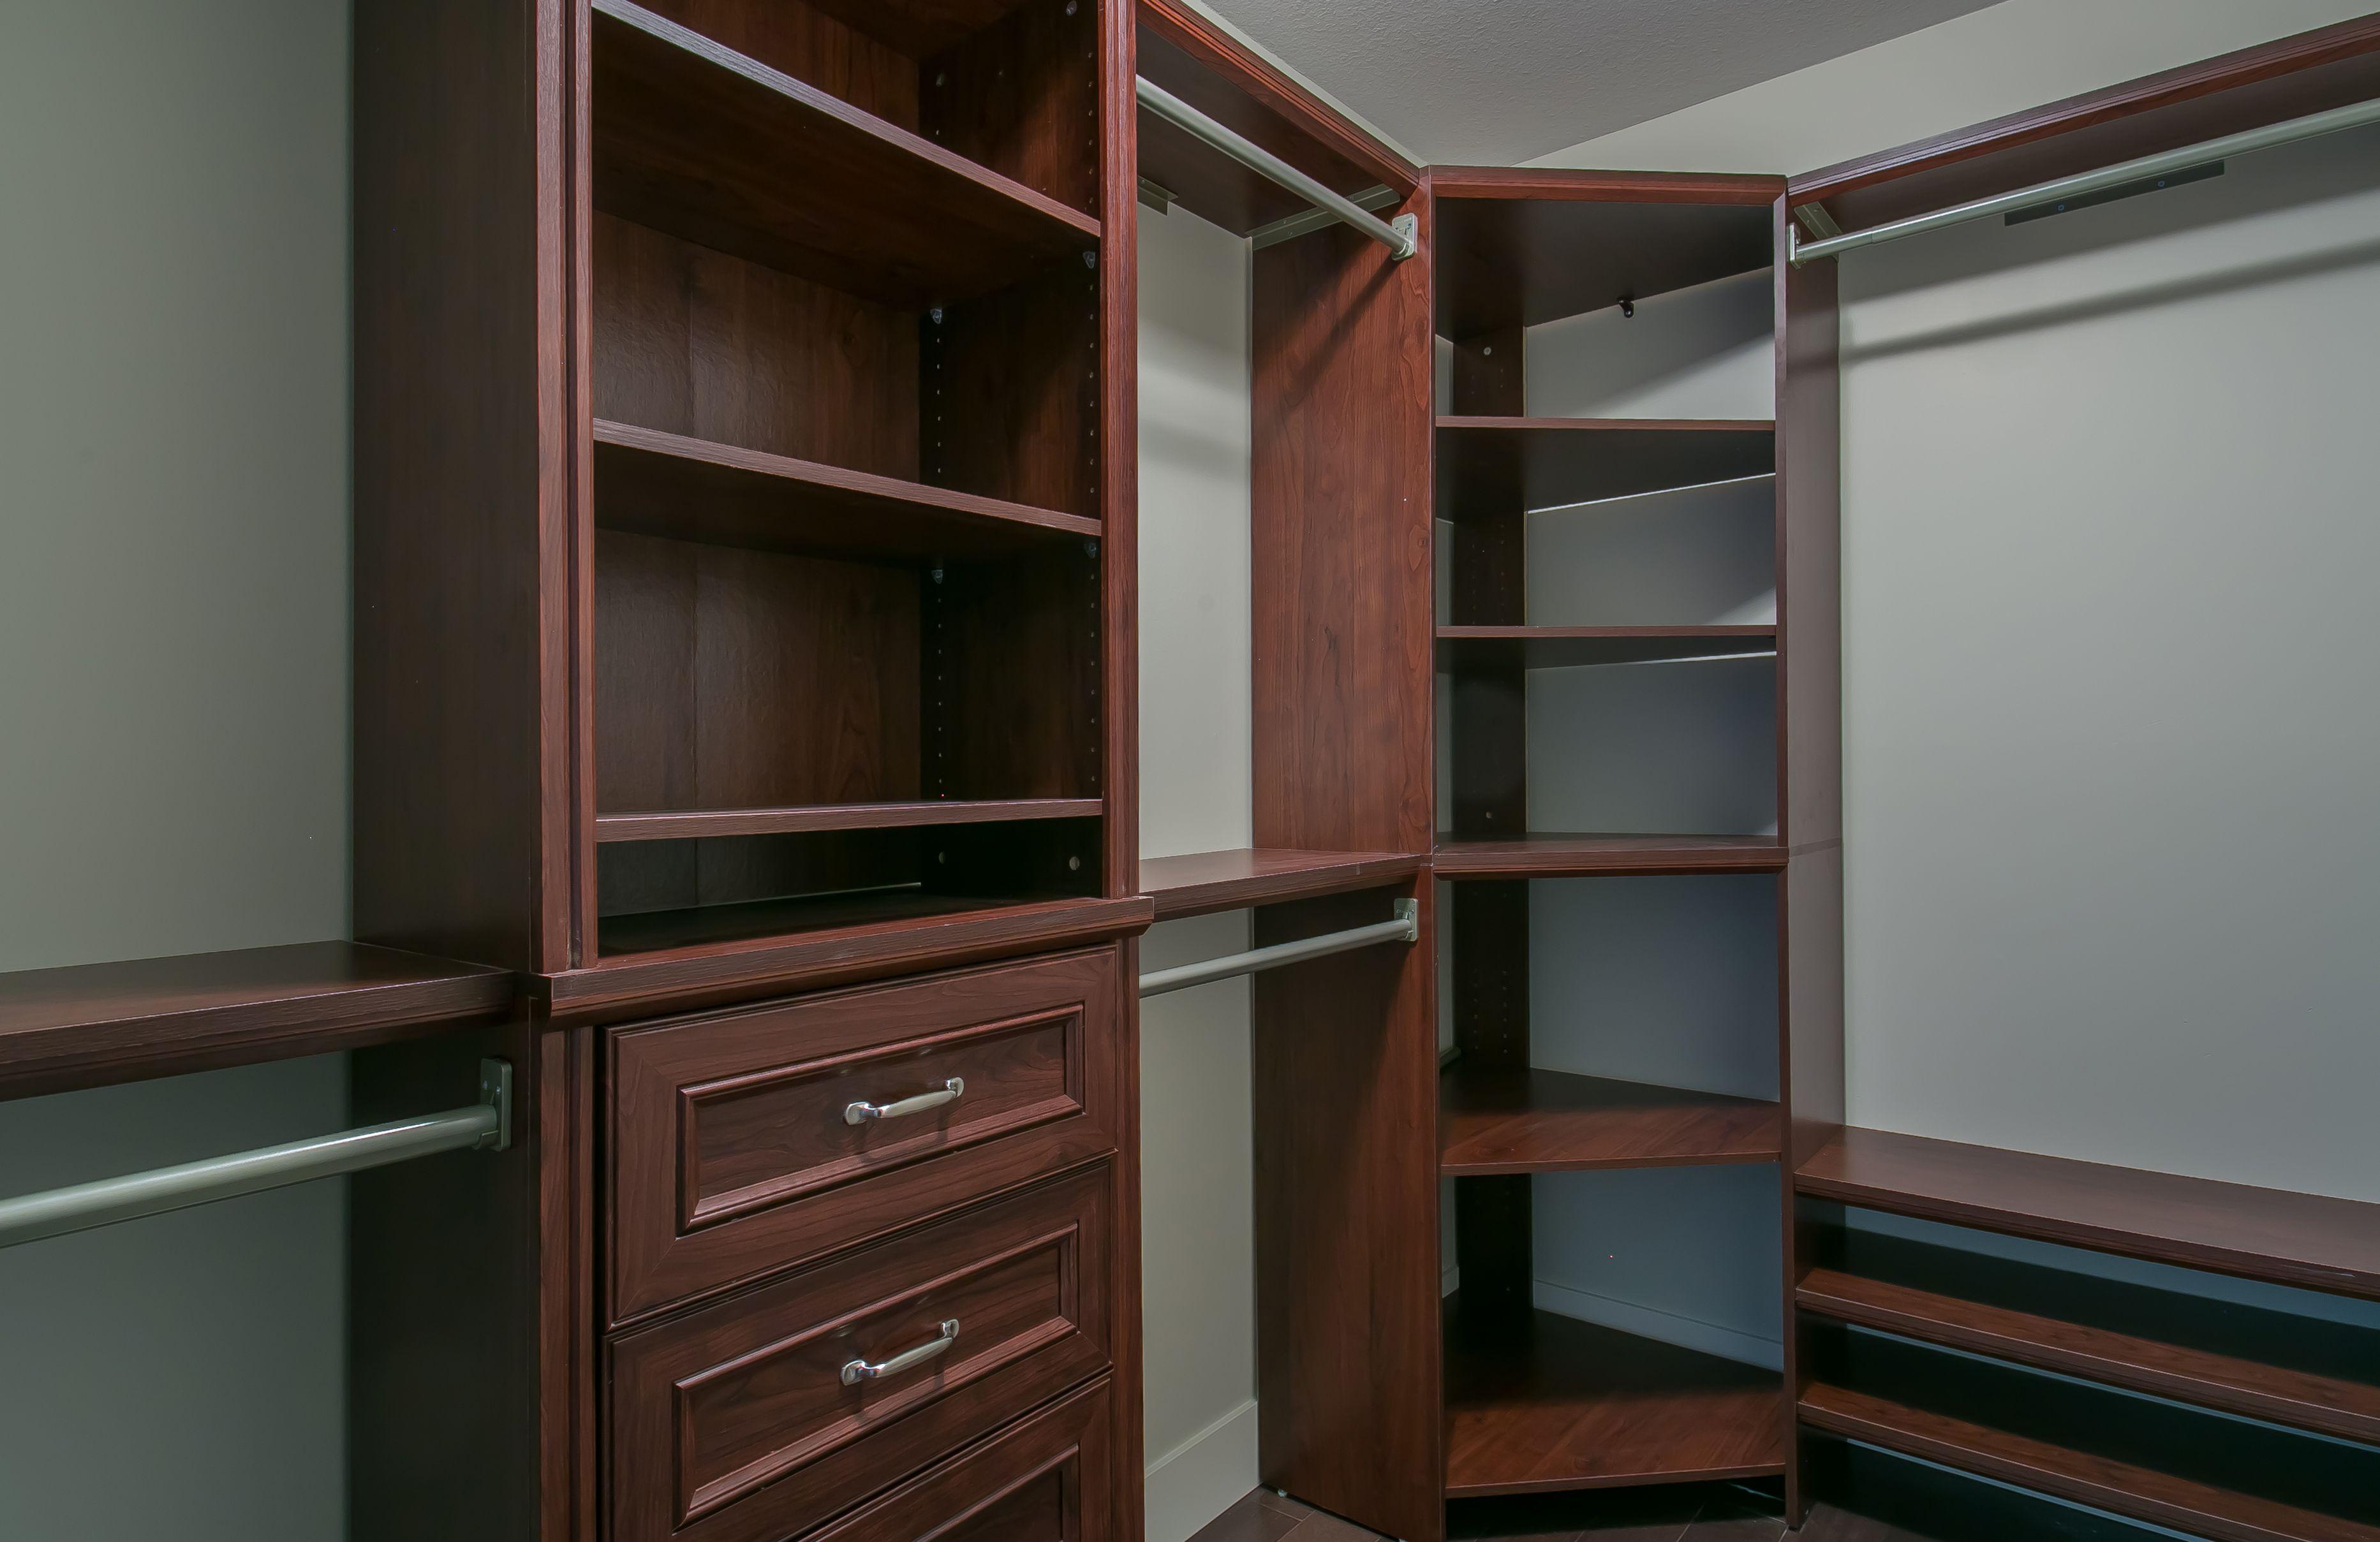 Allen Roth Closet Organizers Closetmaid Ocala Fl Lowes Closet Systems Lowes  Closet Systems Closet Organizer Systems Lowes IN Closet Organizers Lowes